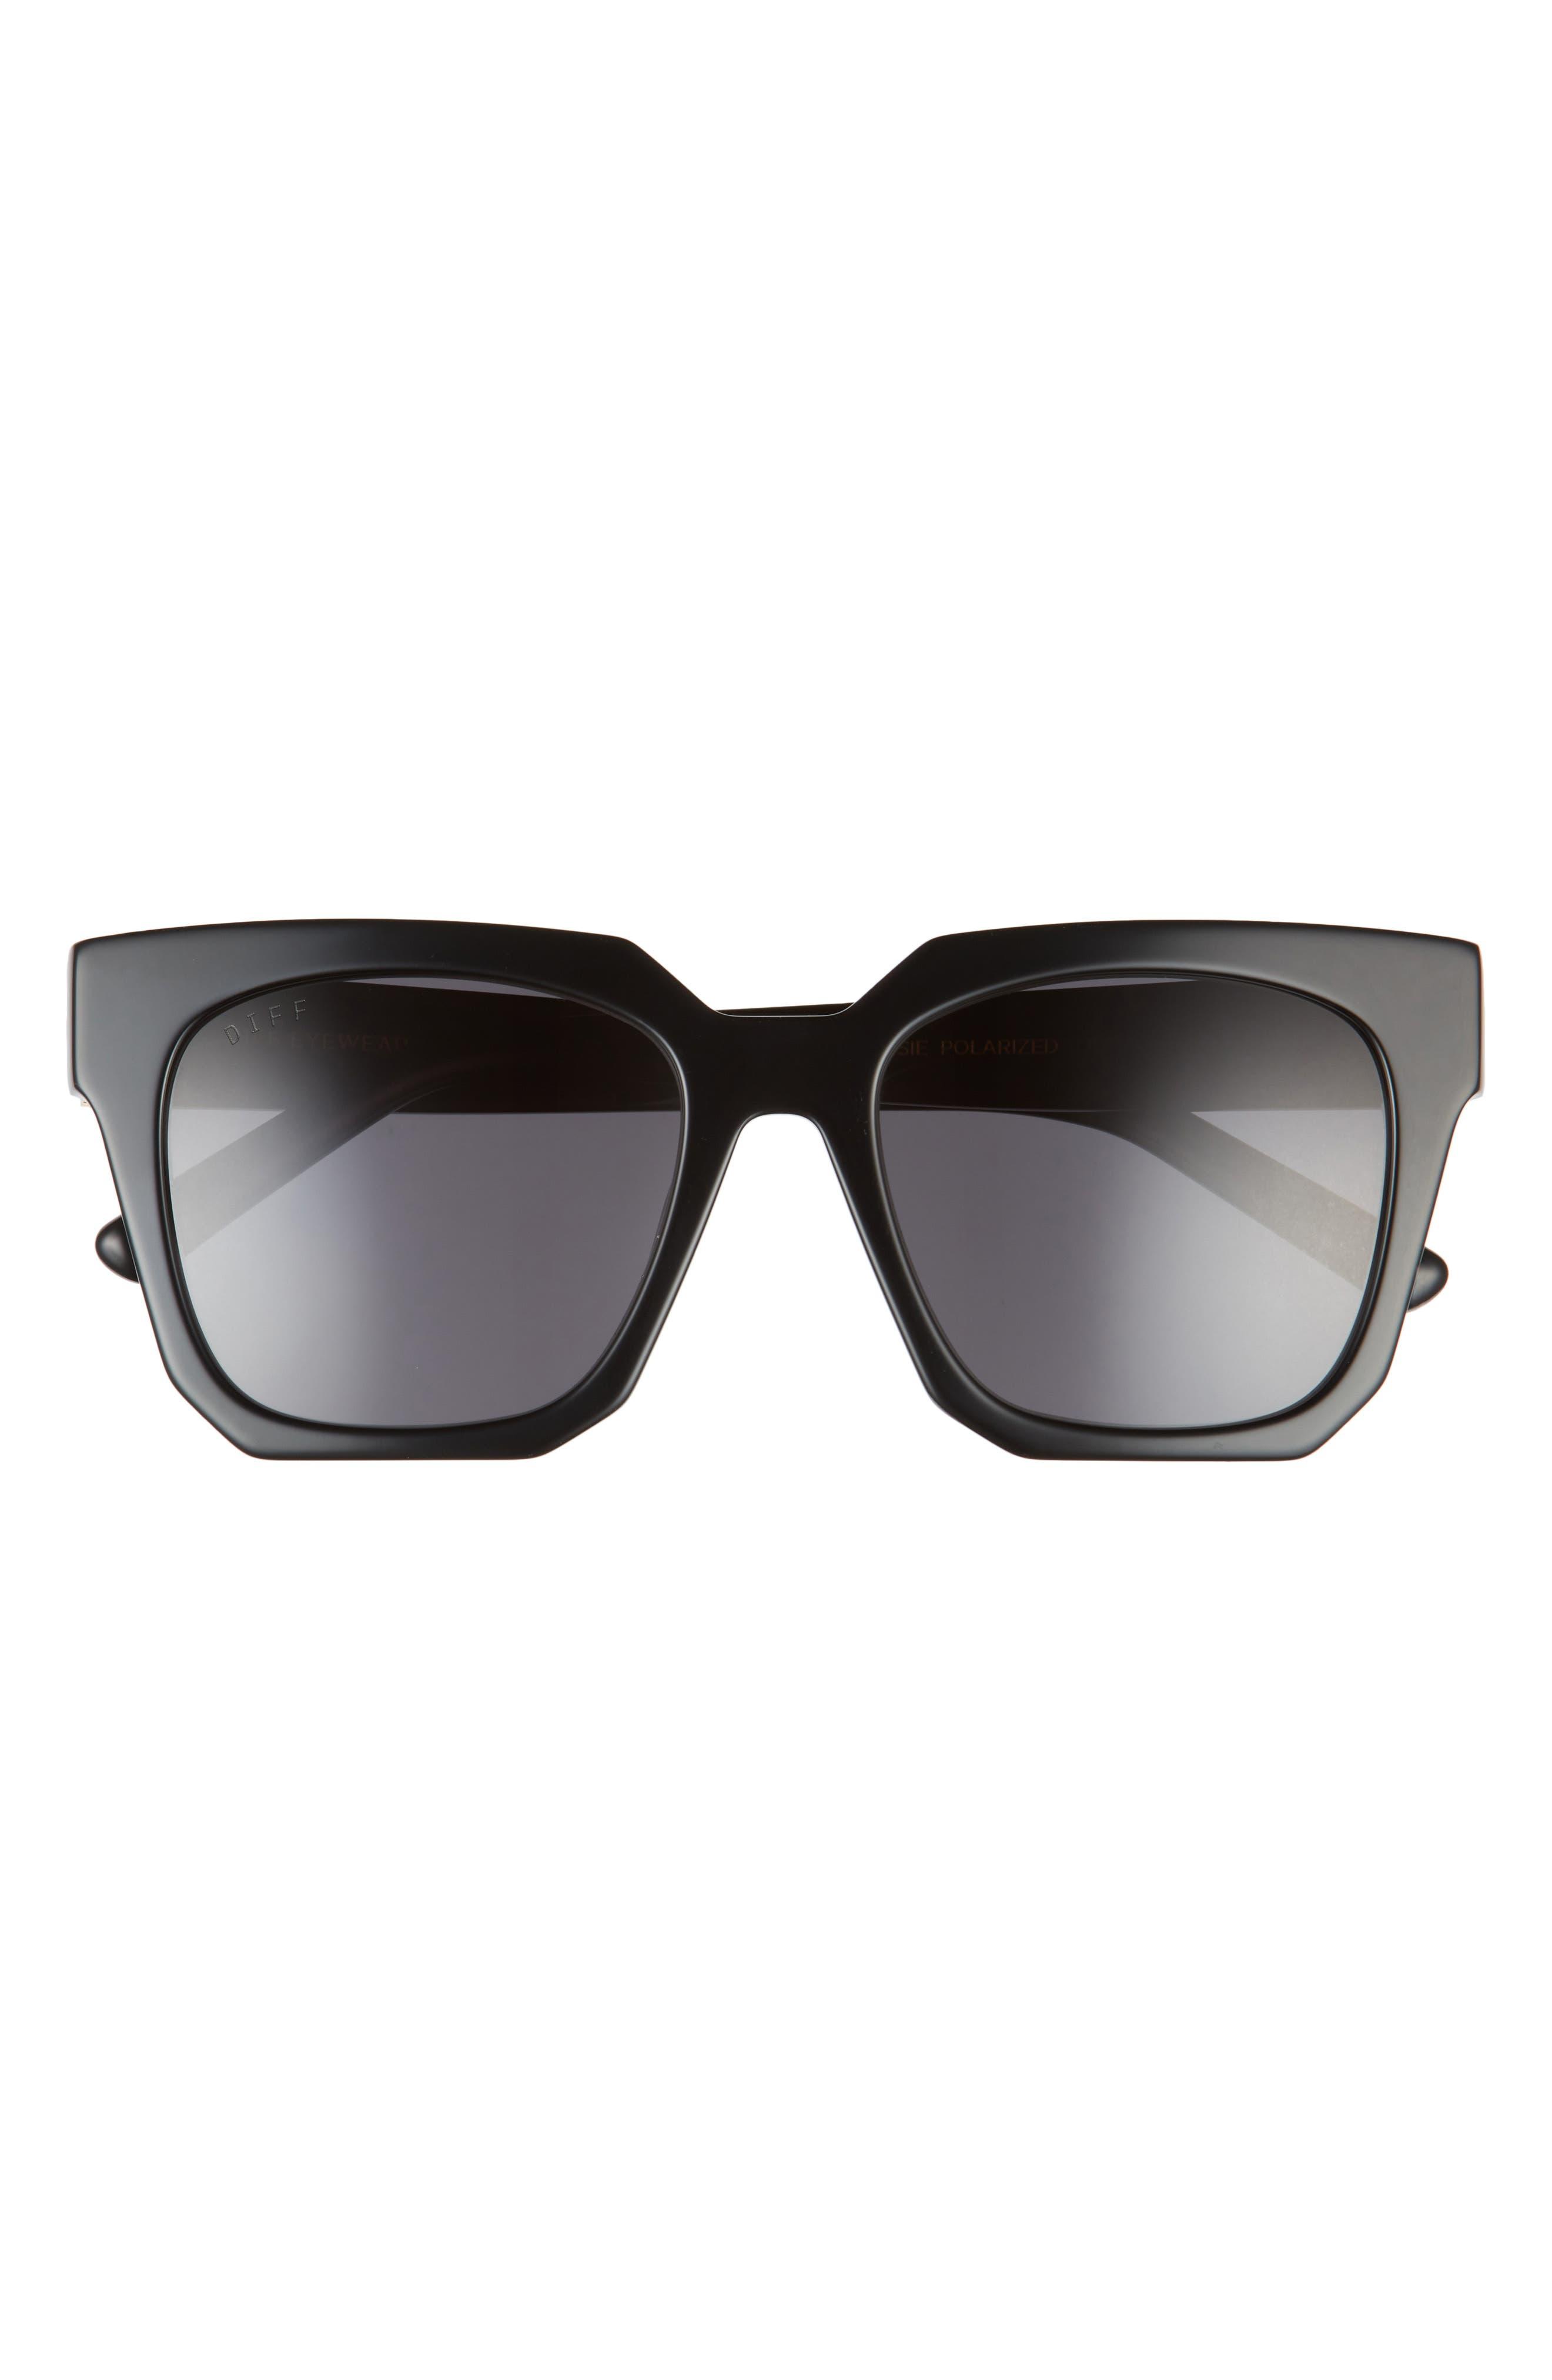 Ariana 54mm Polarized Square Sunglasses